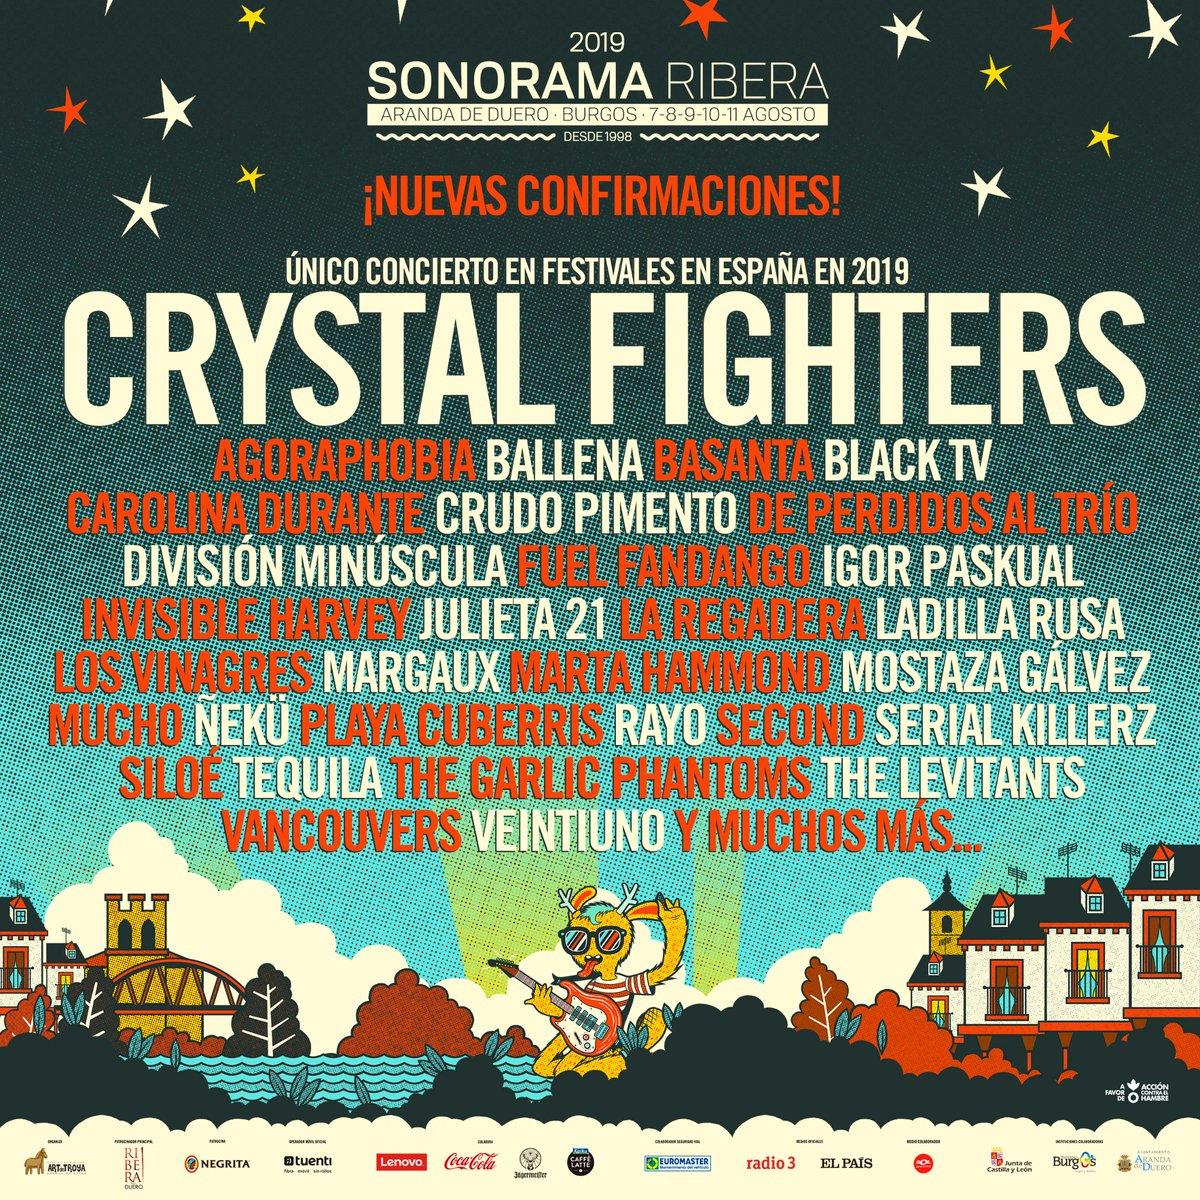 Sonorama 2019 - Página 15 D1sSYkzWkAA0k3-